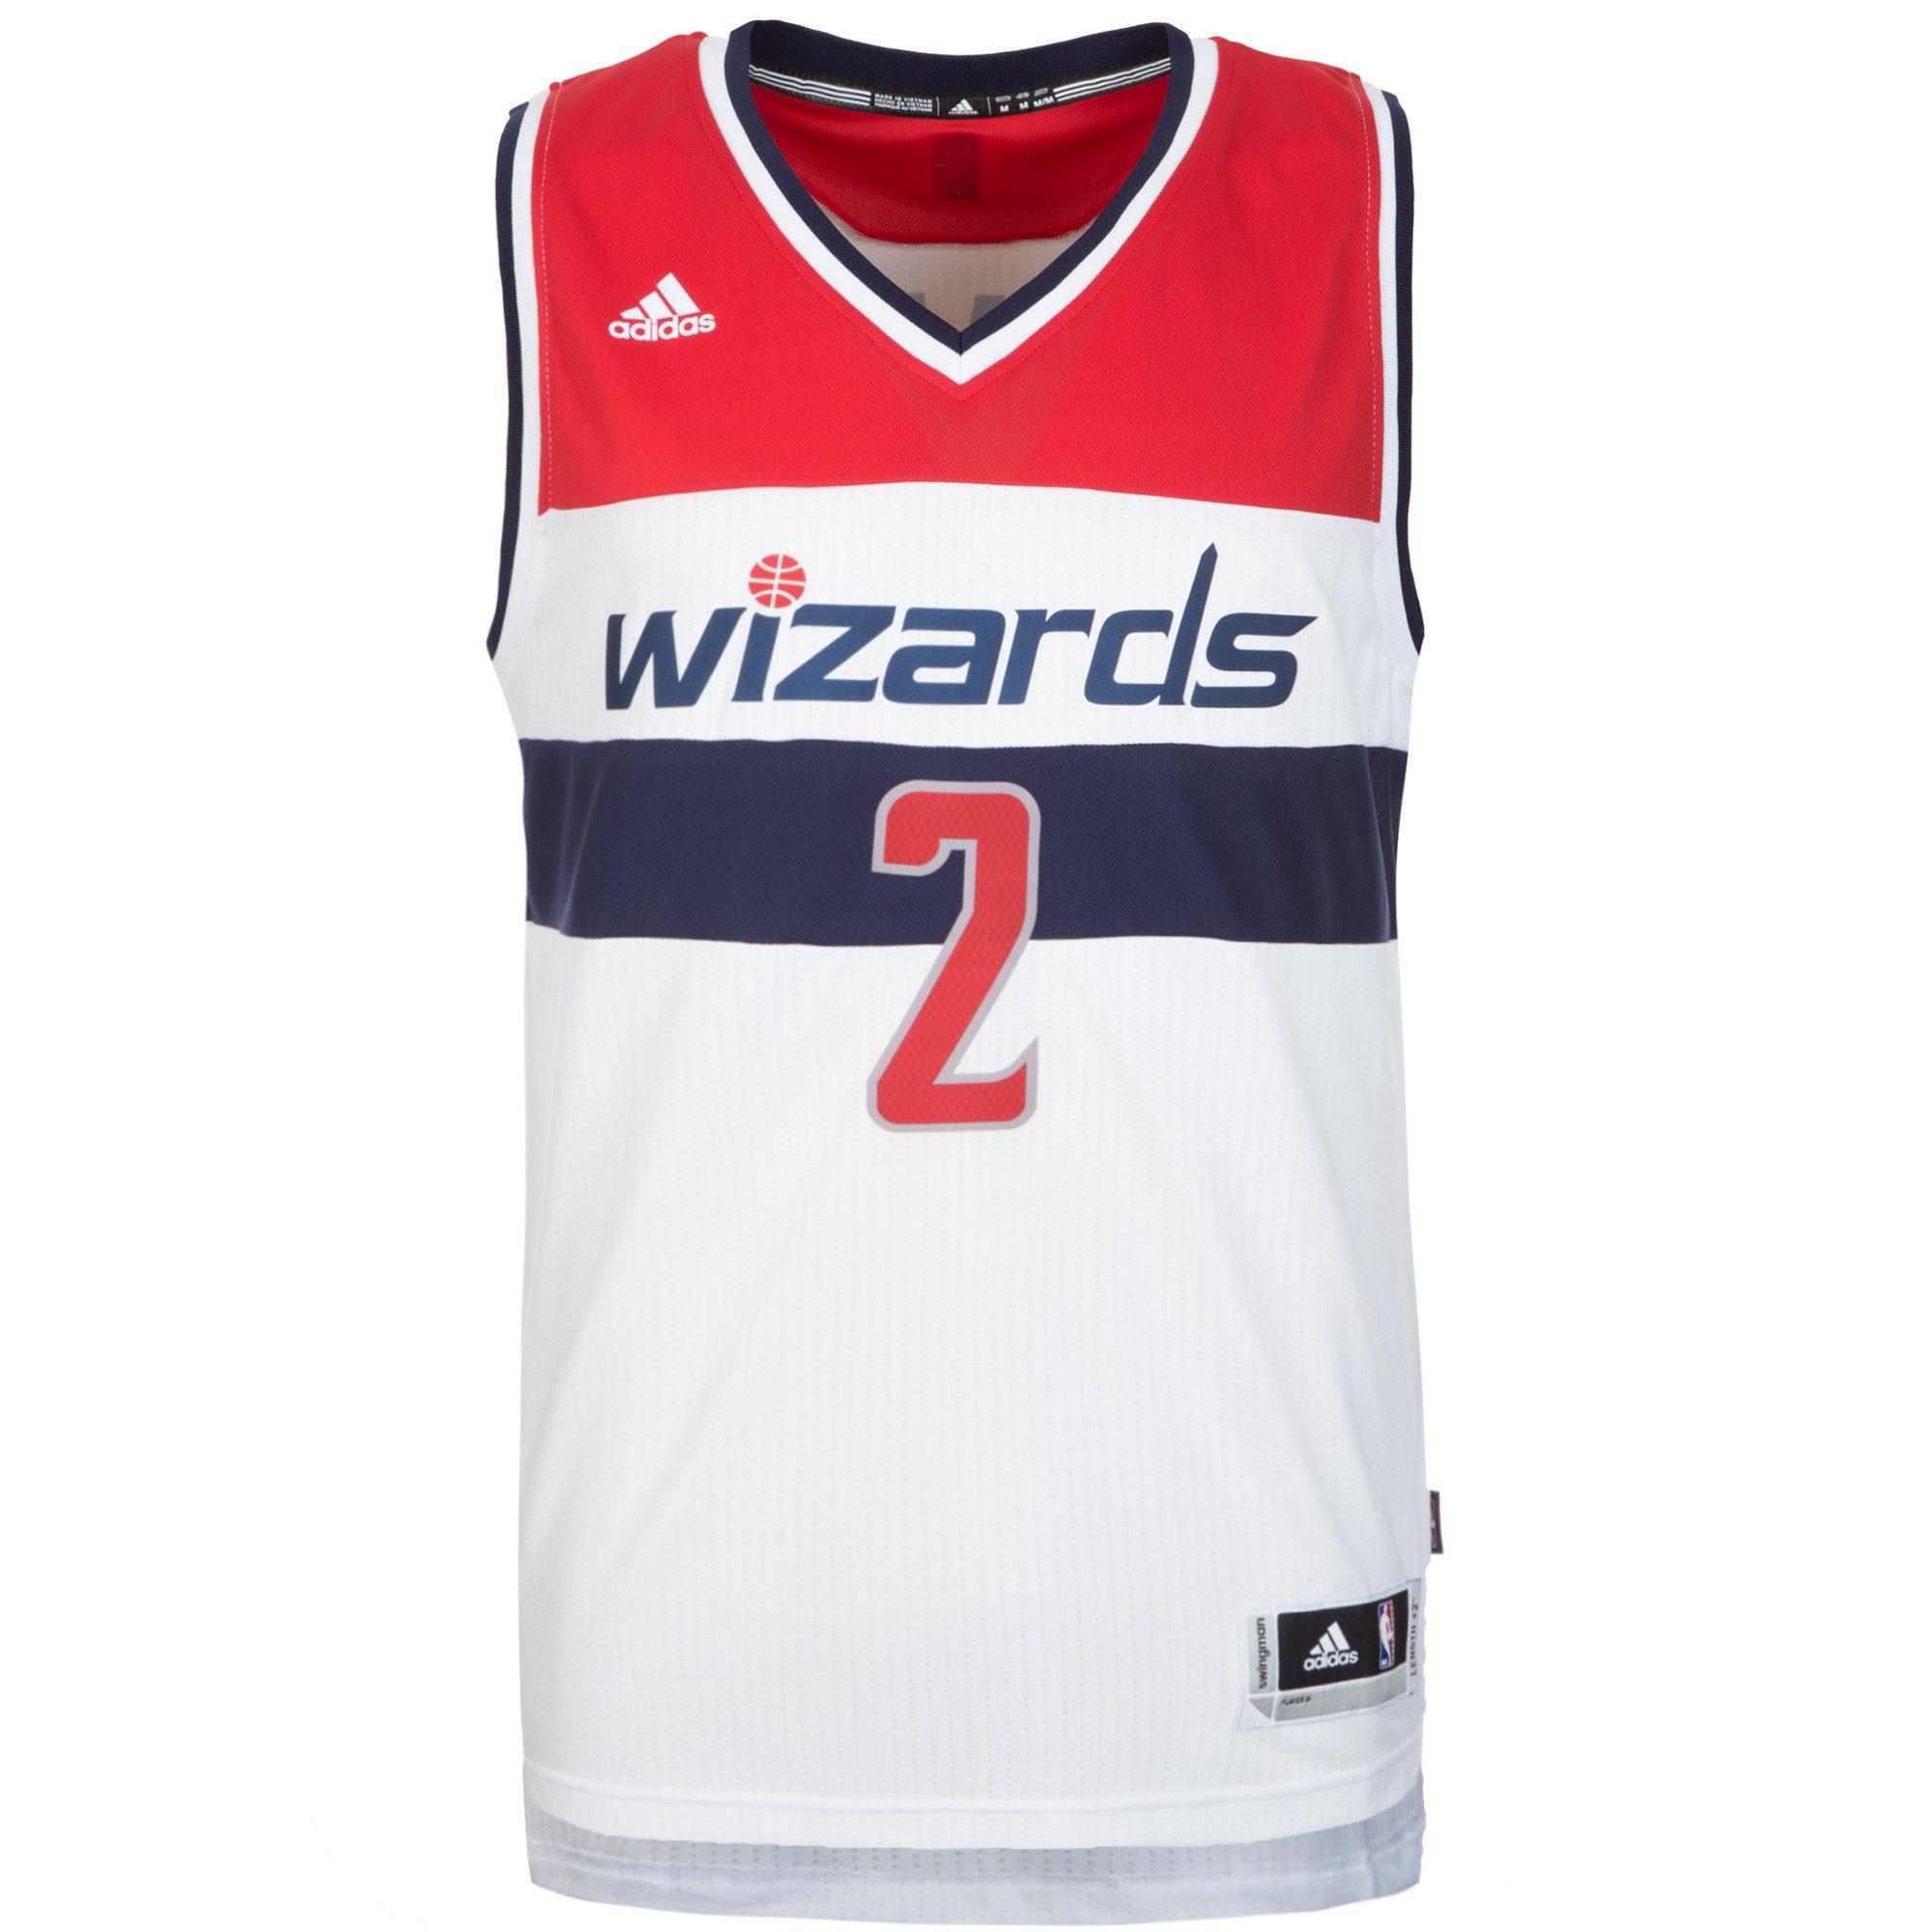 adidas Performance Basketballtrikot Washington Wizards Wall Swingman | Sportbekleidung > Trikots > Basketballtrikots | Weiß | Trikot | Adidas Performance